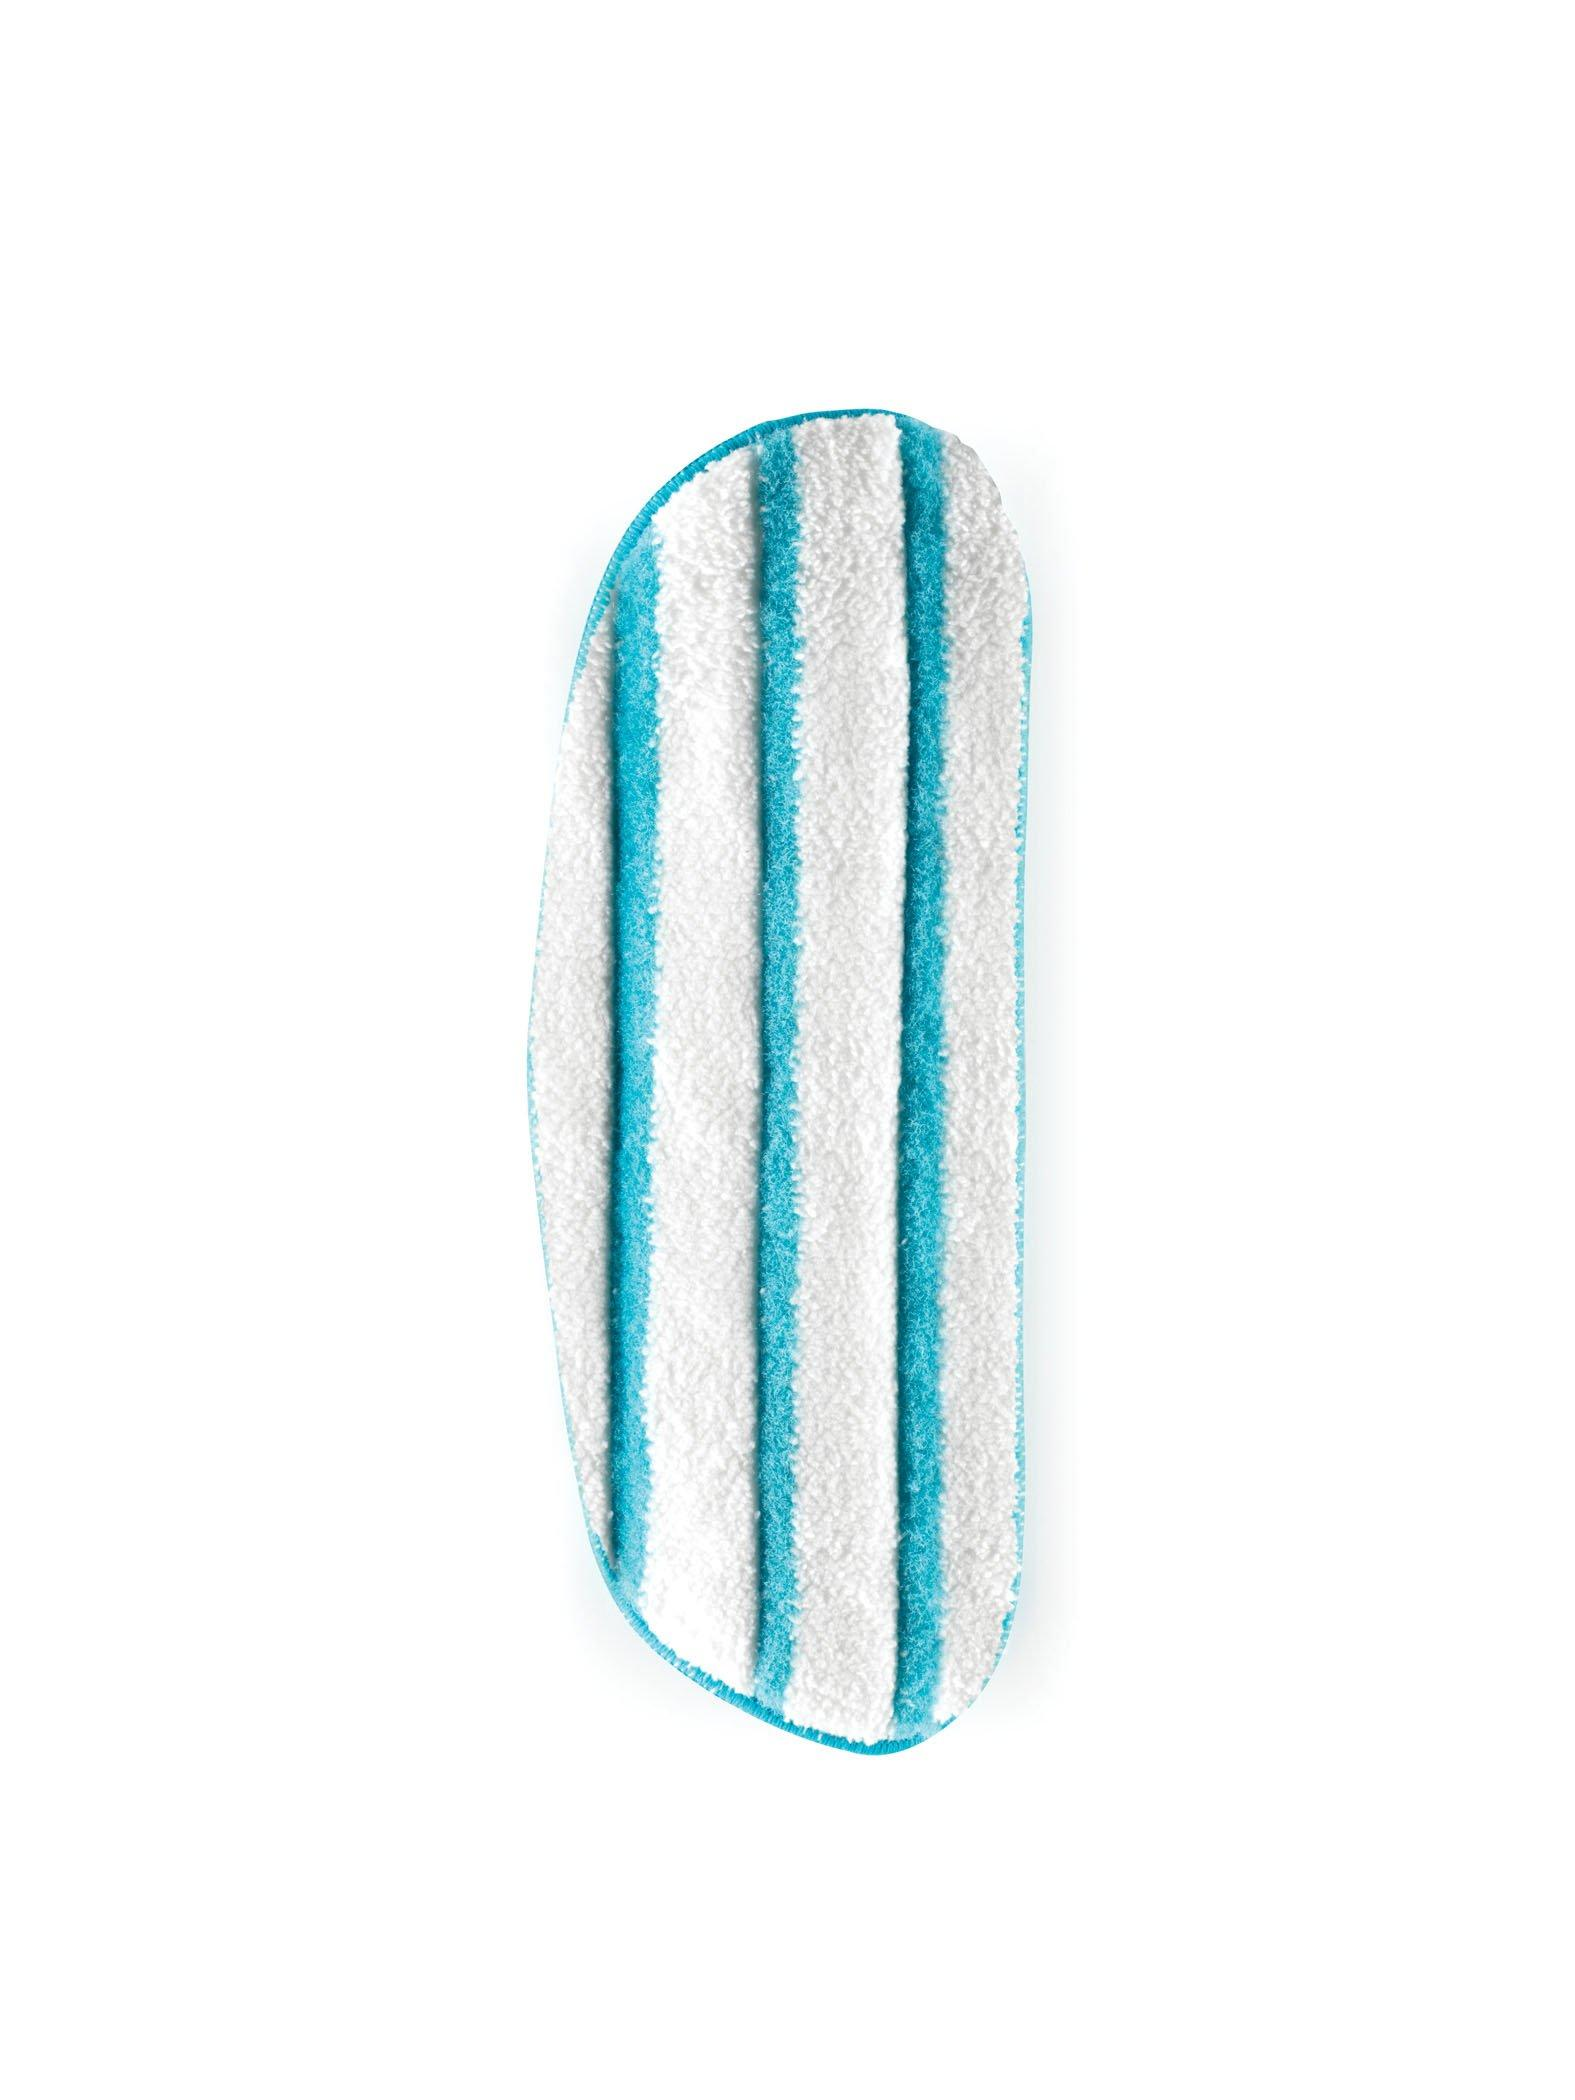 SWIPES Washable Microfiber Scrubbing Pad for Spray+Mop & Steam+Clean2